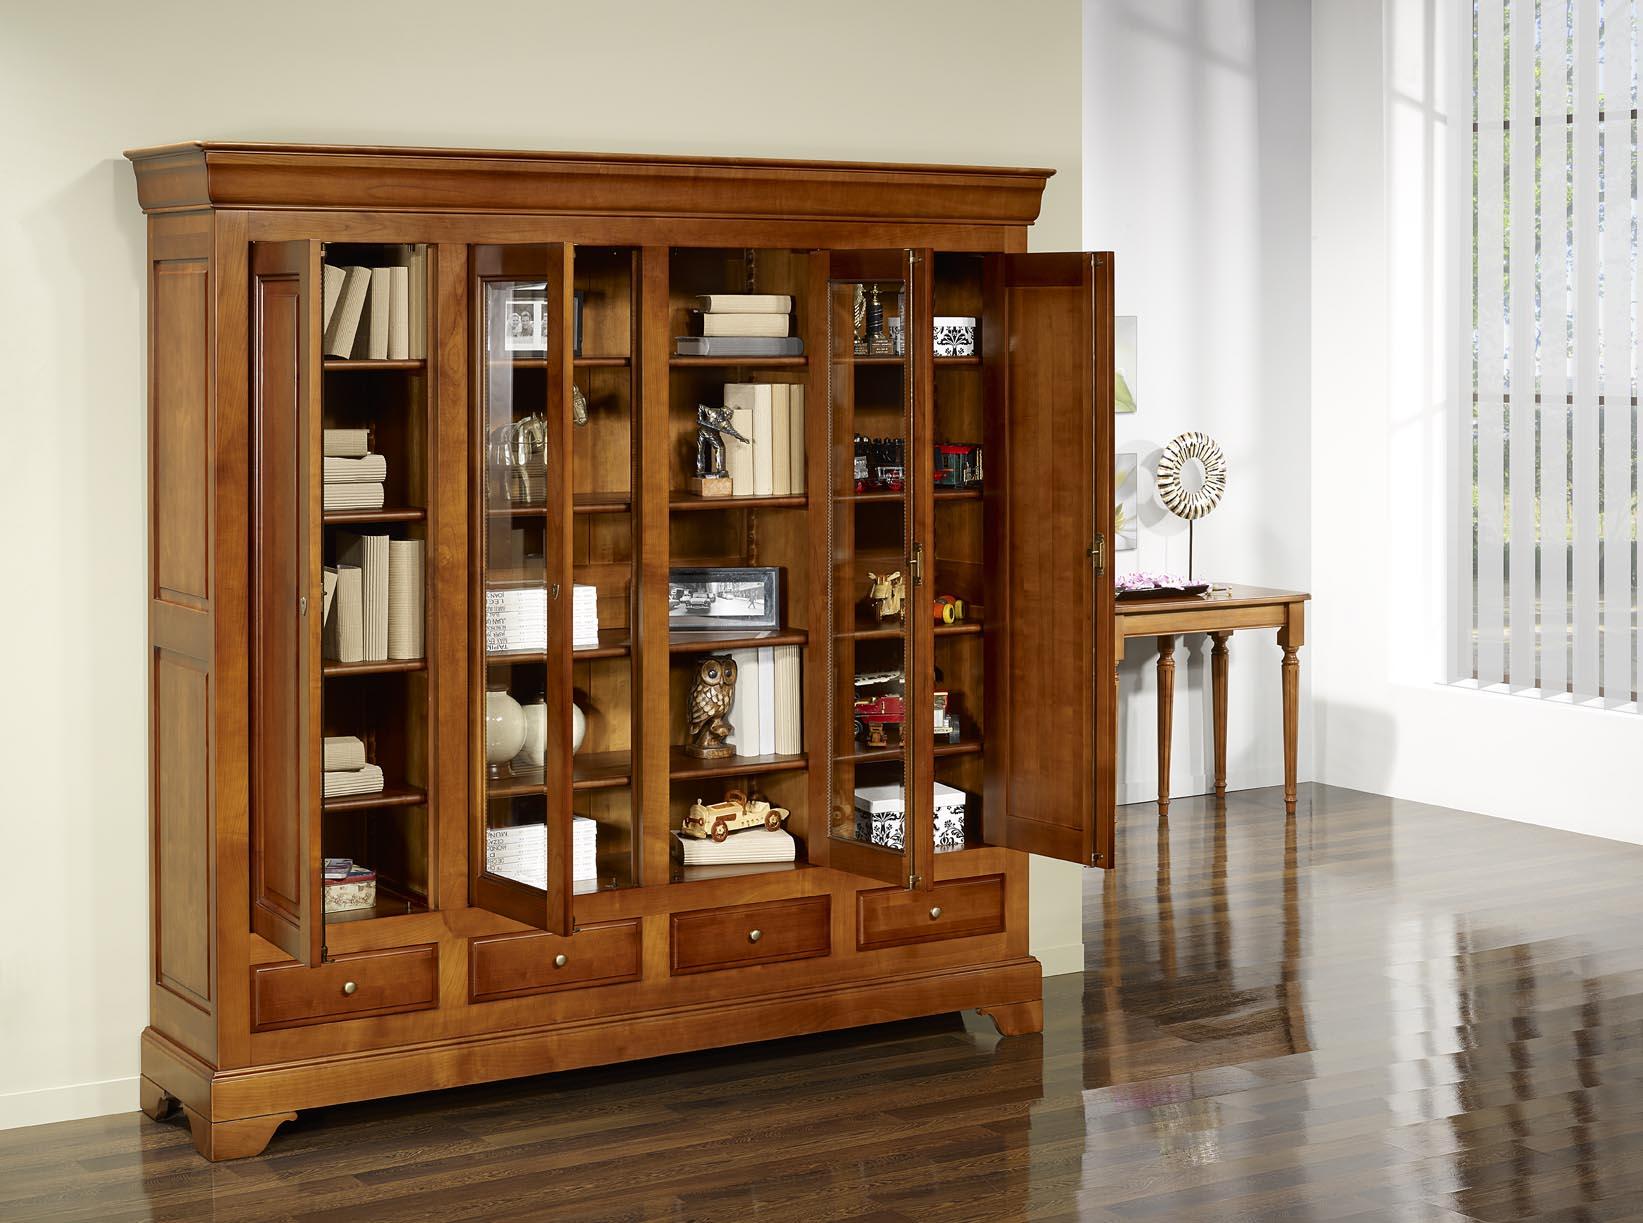 Biblioth que 4 portes in s en merisier massif de style louis philippe meubl - Bibliotheque bois massif ikea ...